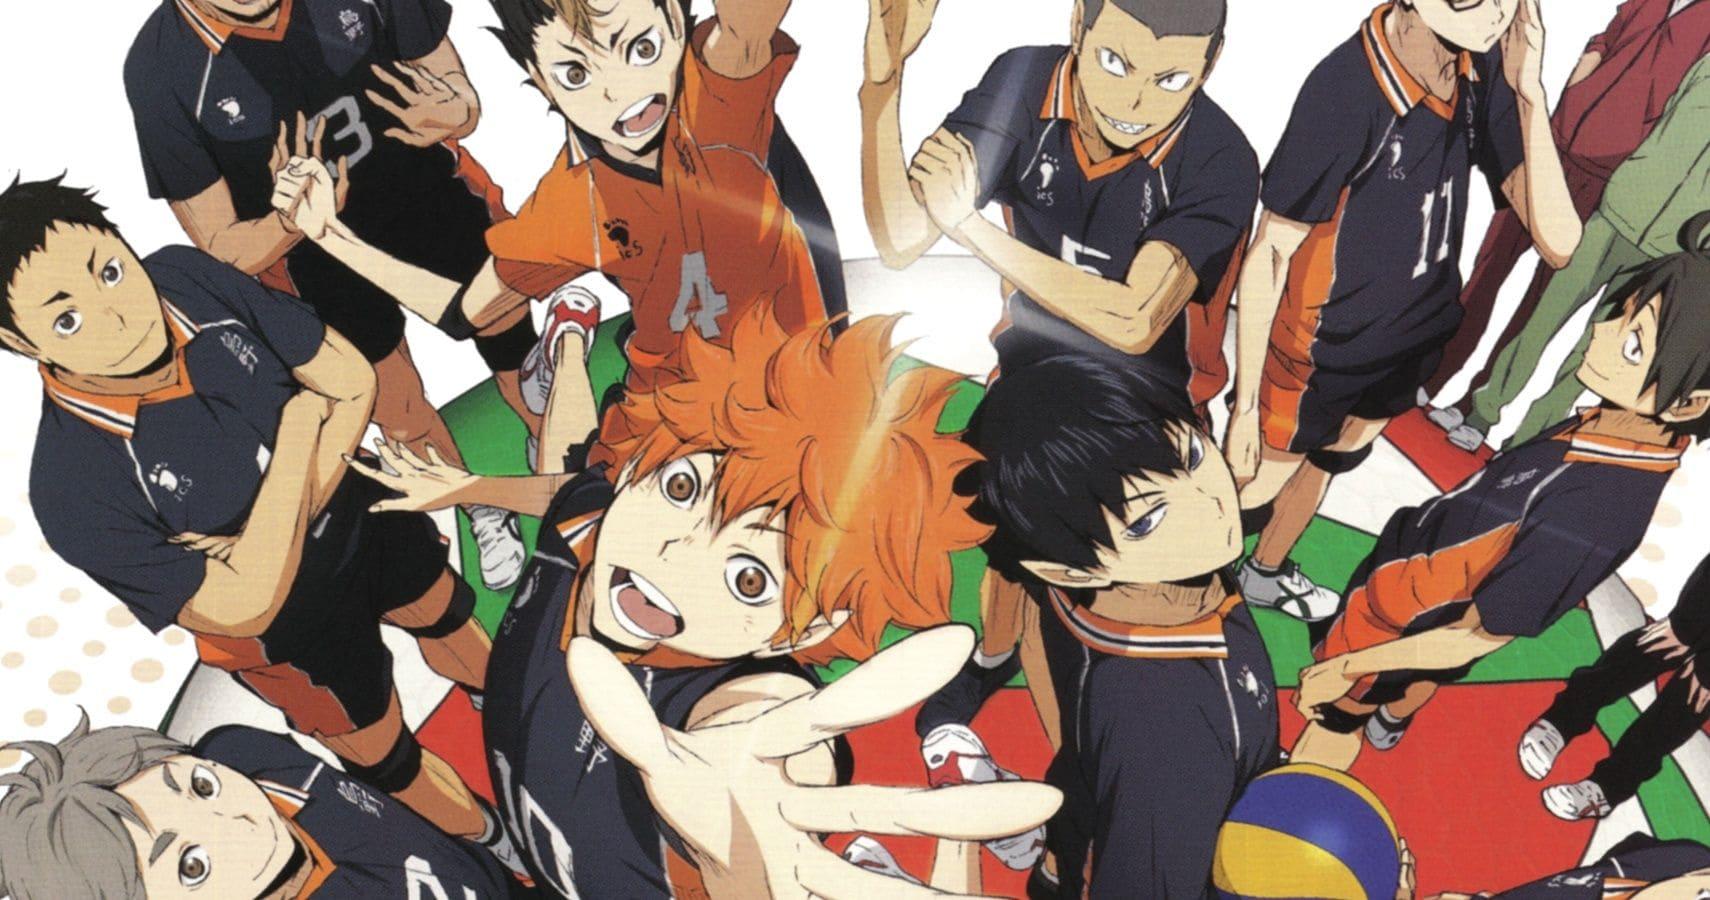 3 Best Sites To Read Haikyuu Manga Legally Online